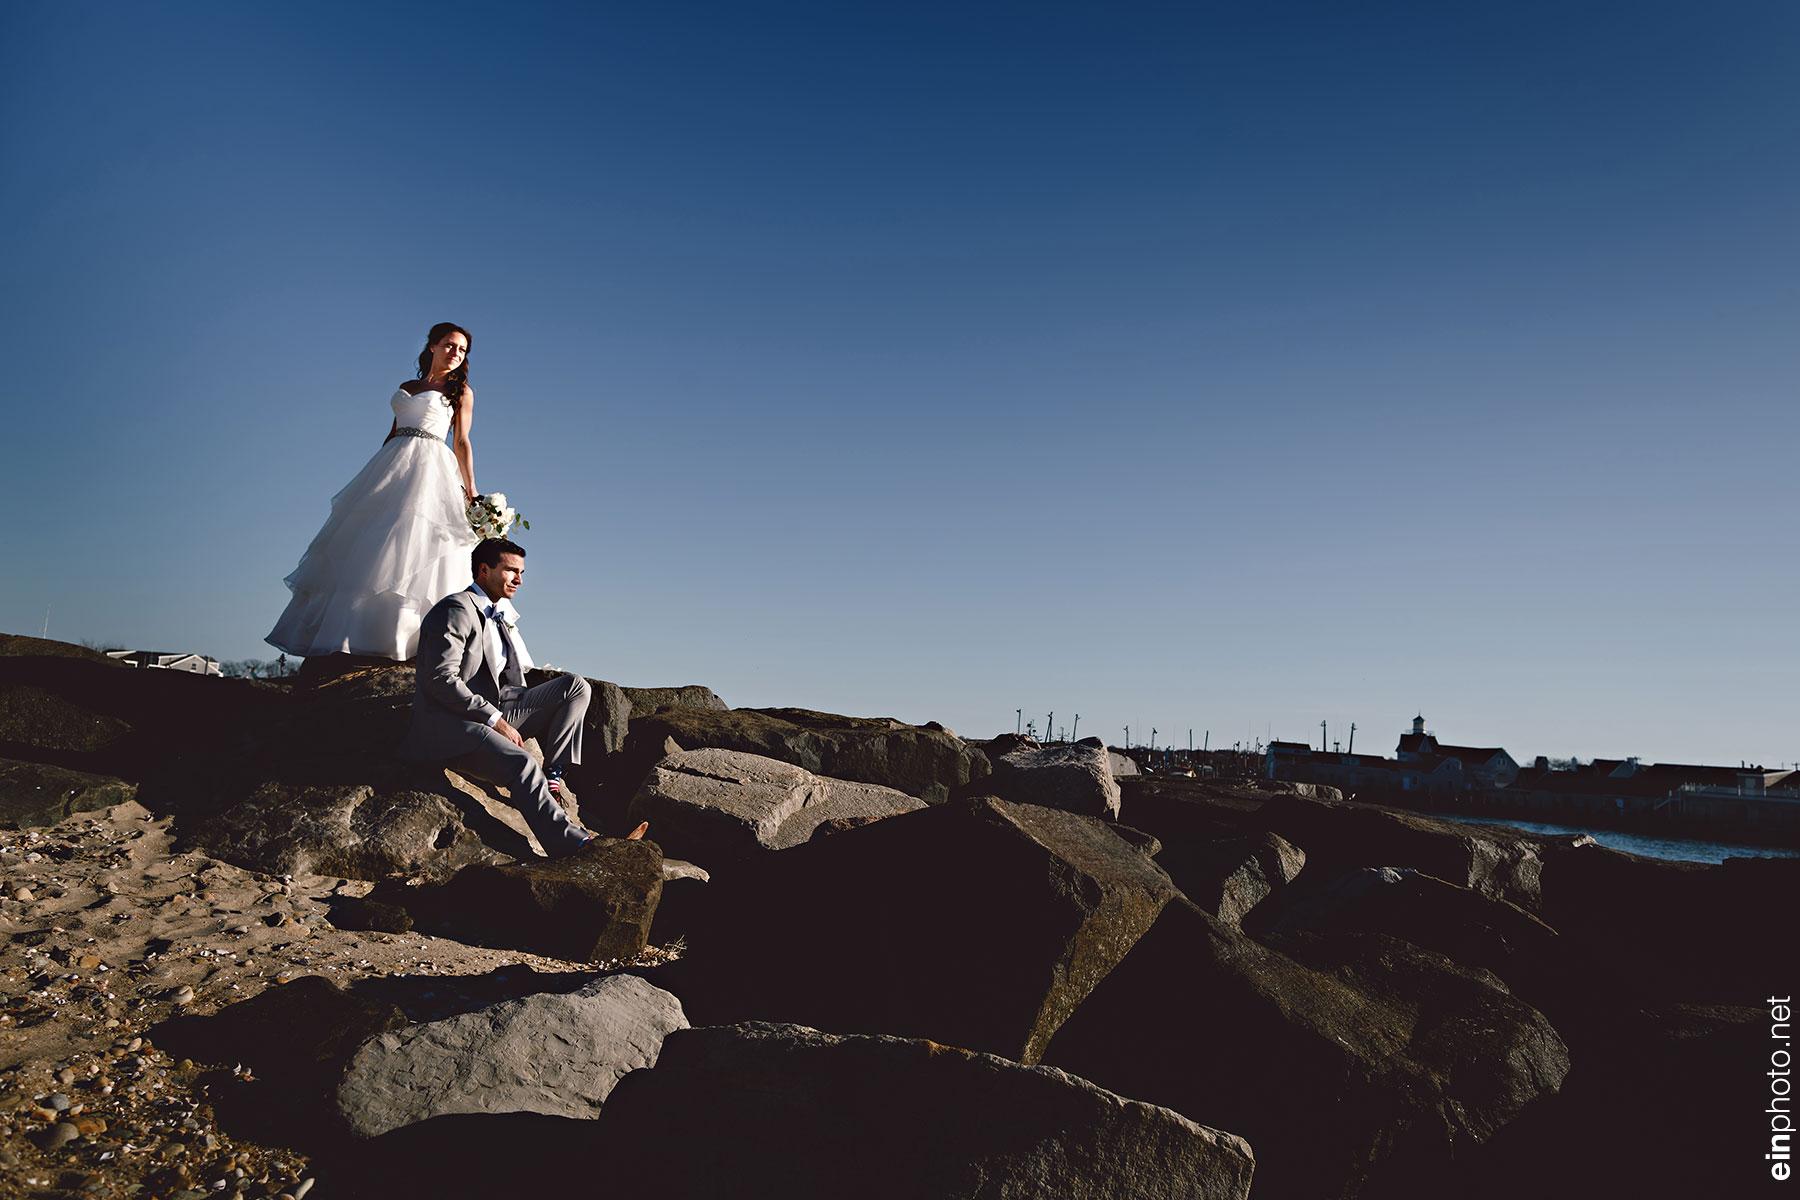 gurneys-montauk-wedding-0001.jpg